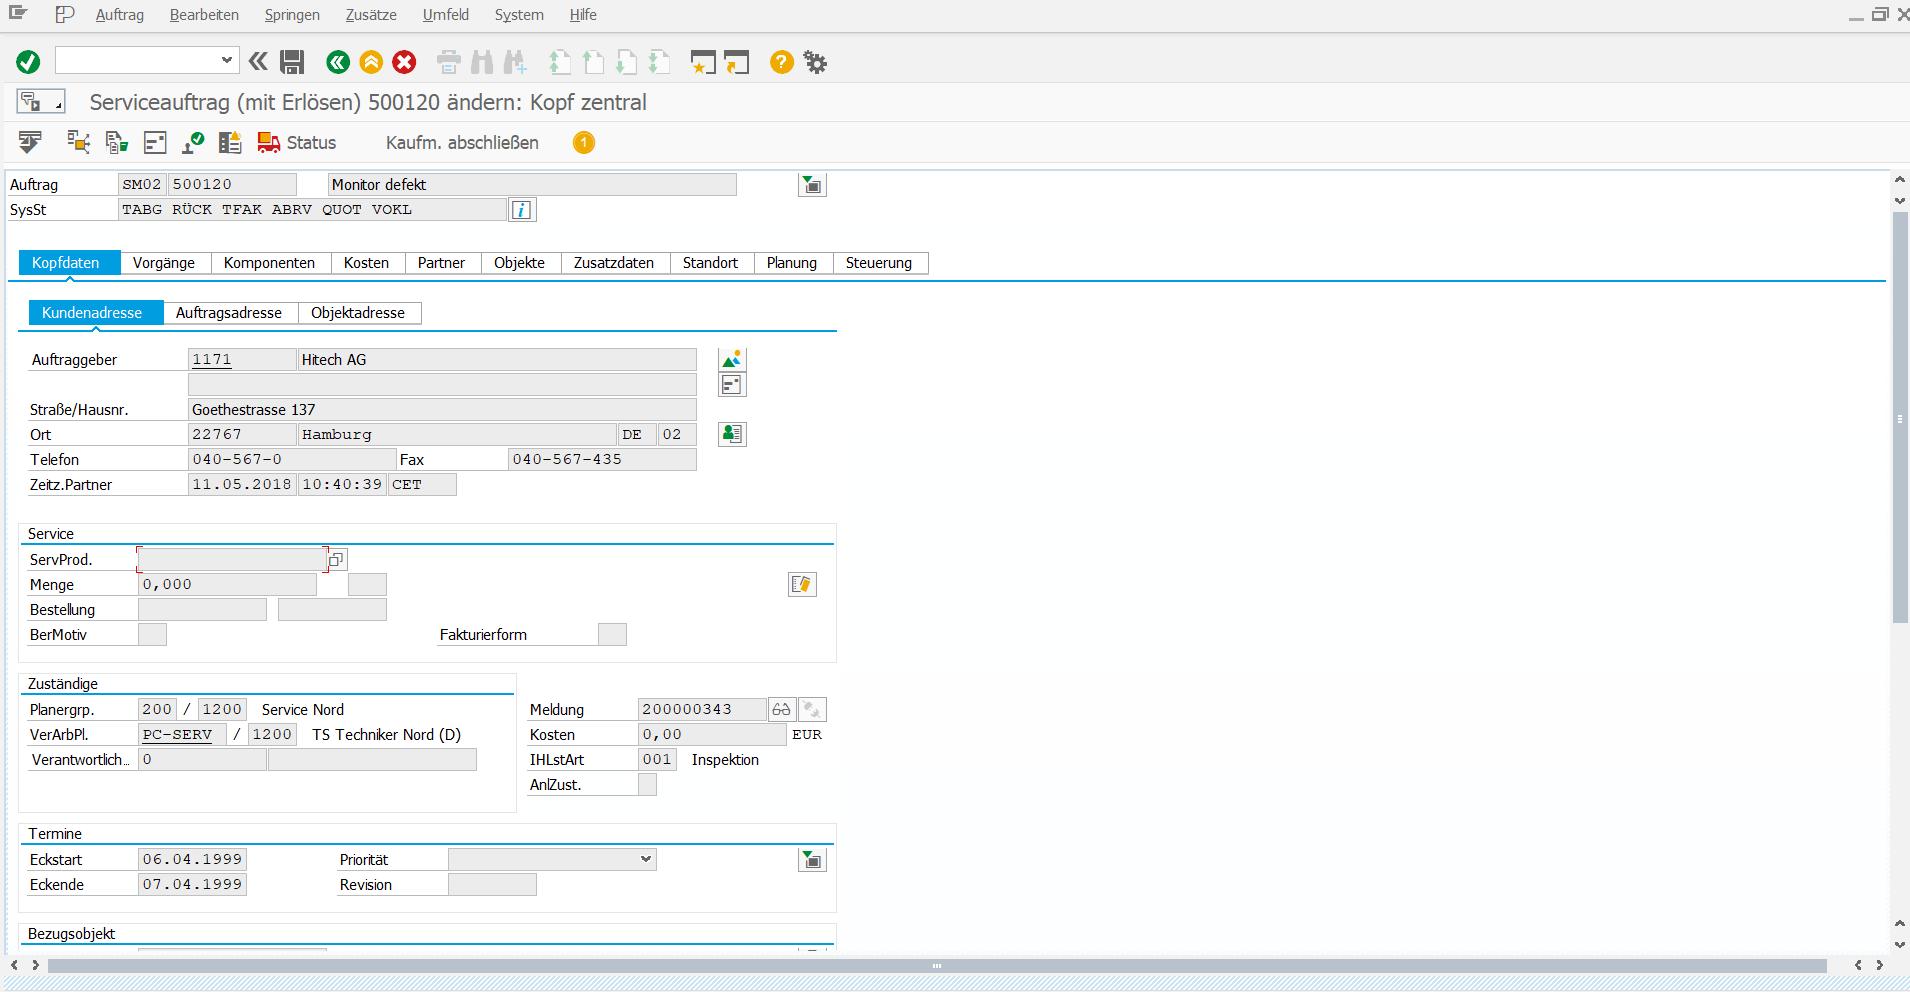 NWBC Sidepanel: IW32 - SAP GUI